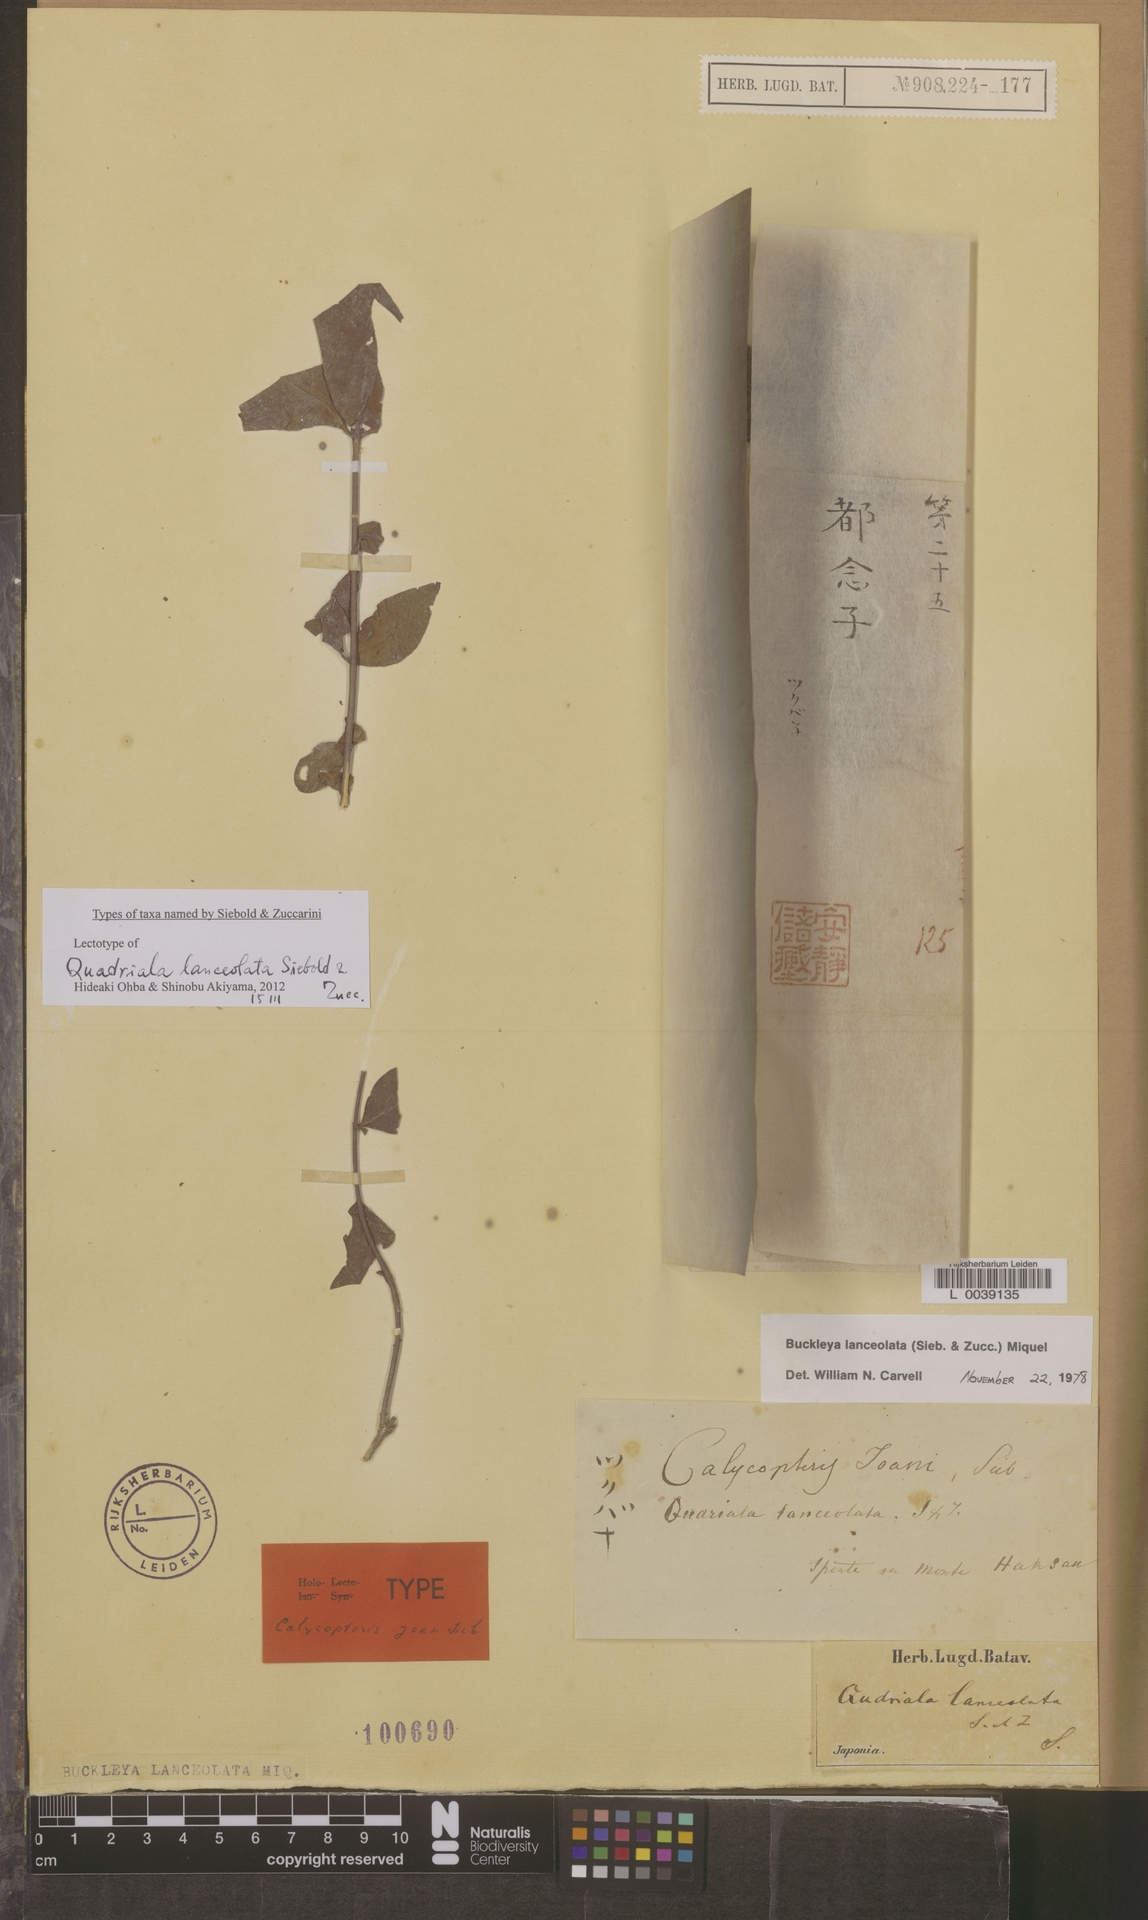 L  0039135 | Buckleya lanceolata (Siebold & Zucc.) Miq.